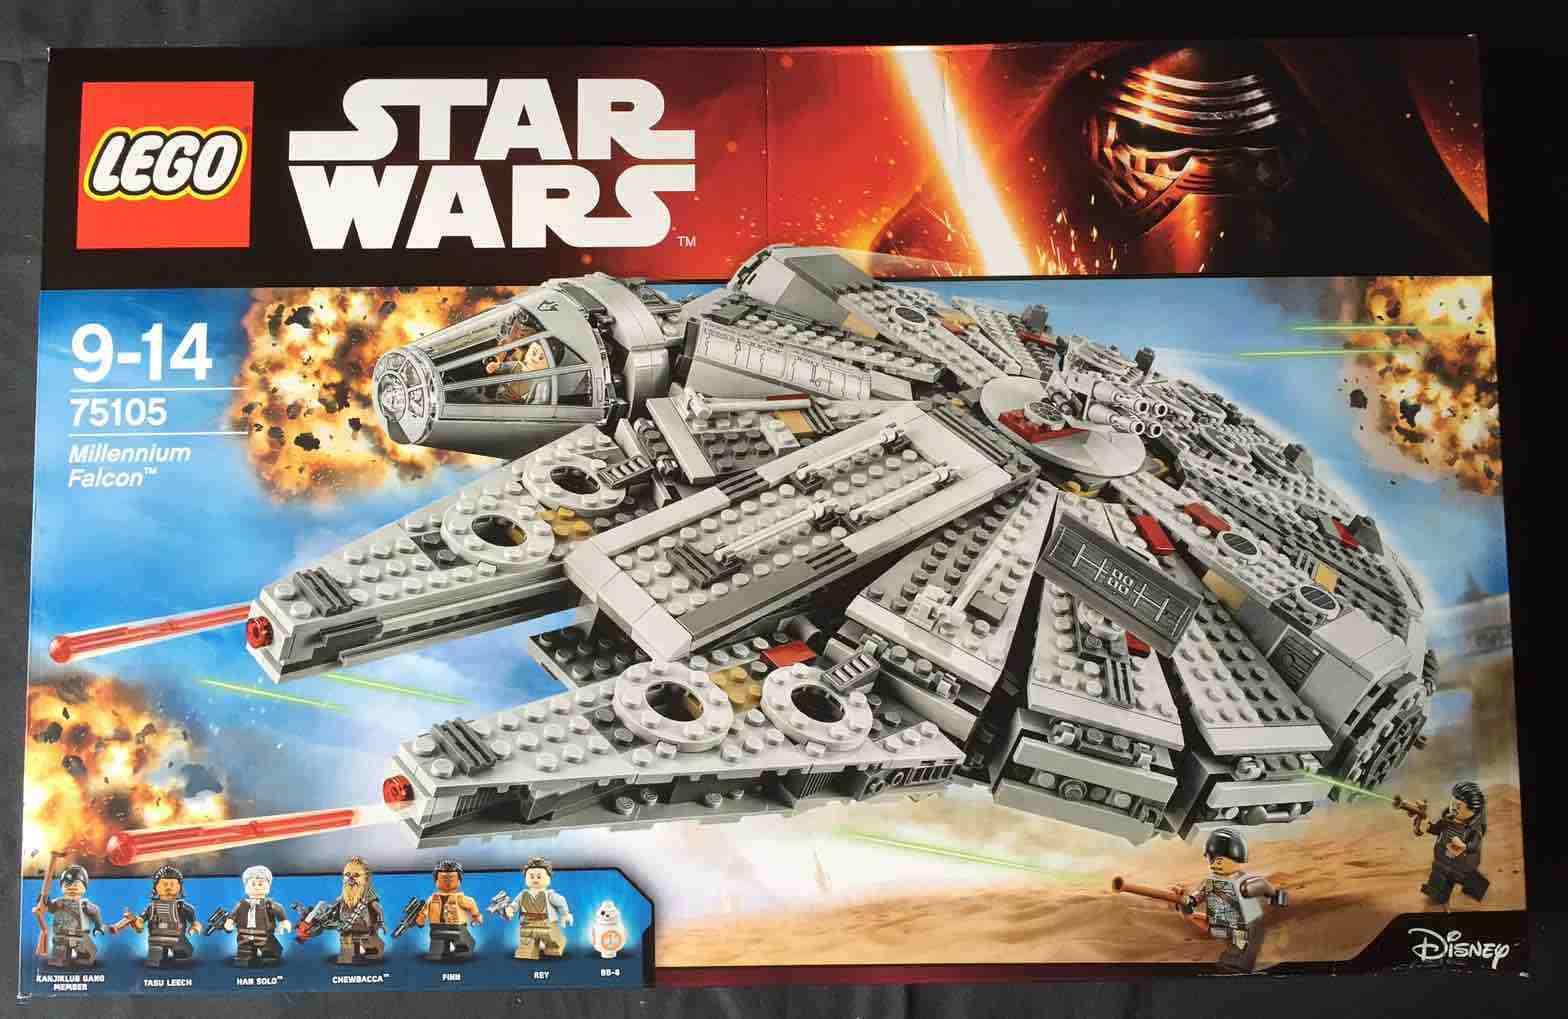 LEGO STAR WARS 75105 - MILLENNIUM FALCON  NO MINIFIGURAS / NO MINIFIGURES